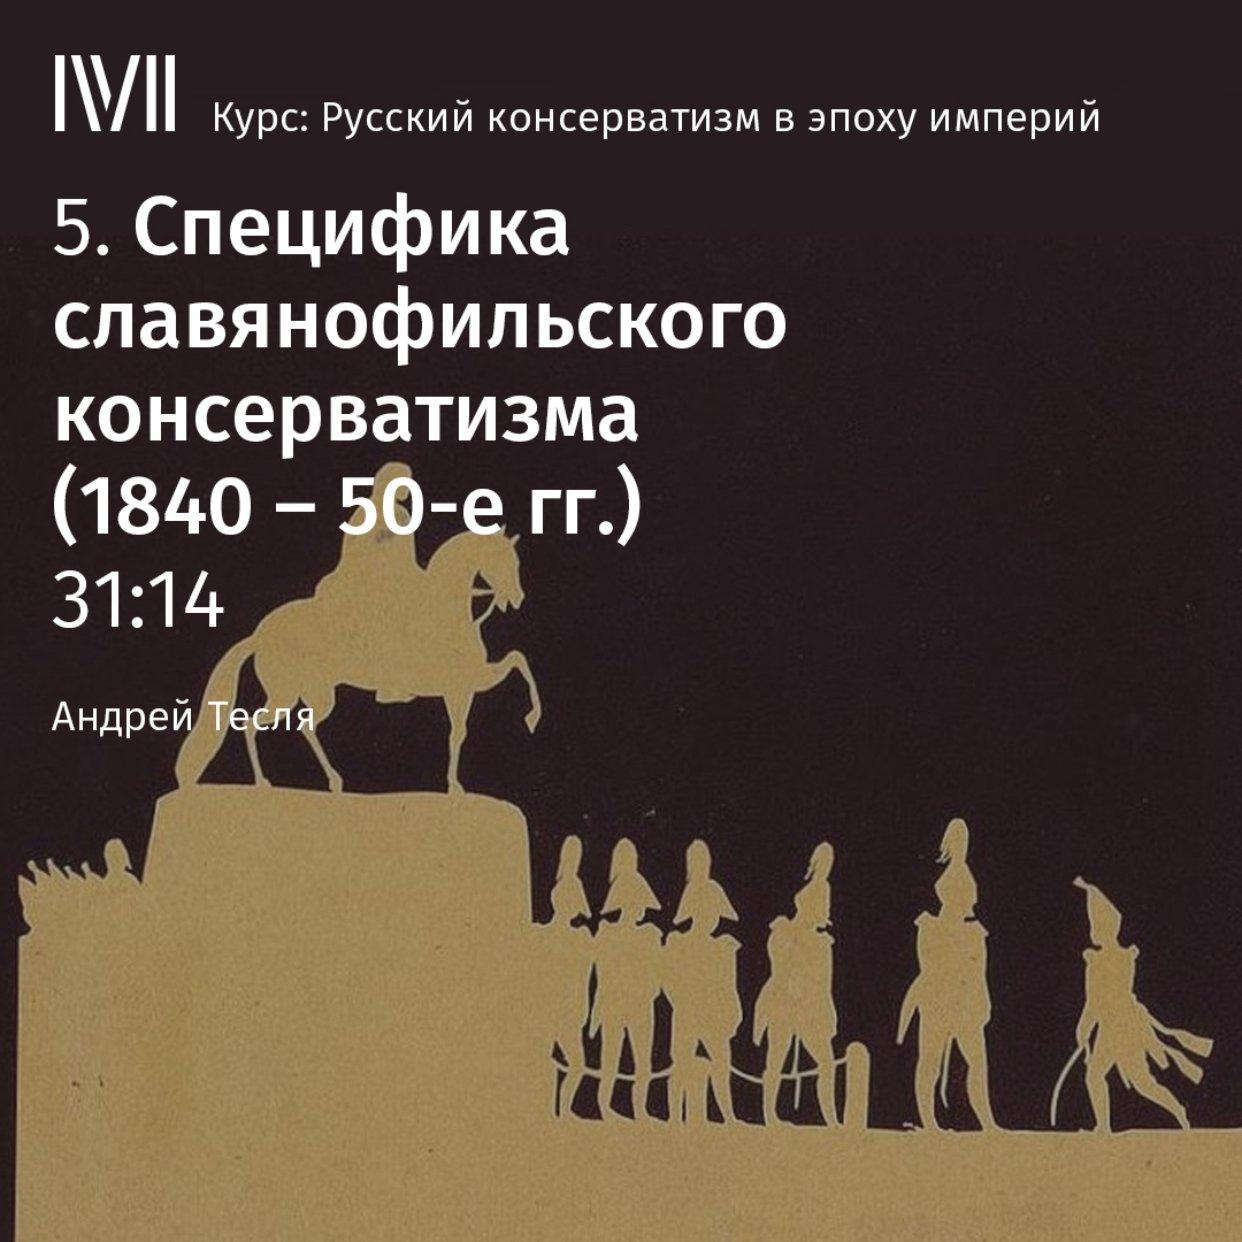 Специфика славянофильского консерватизма (1840 – 50-е гг.)